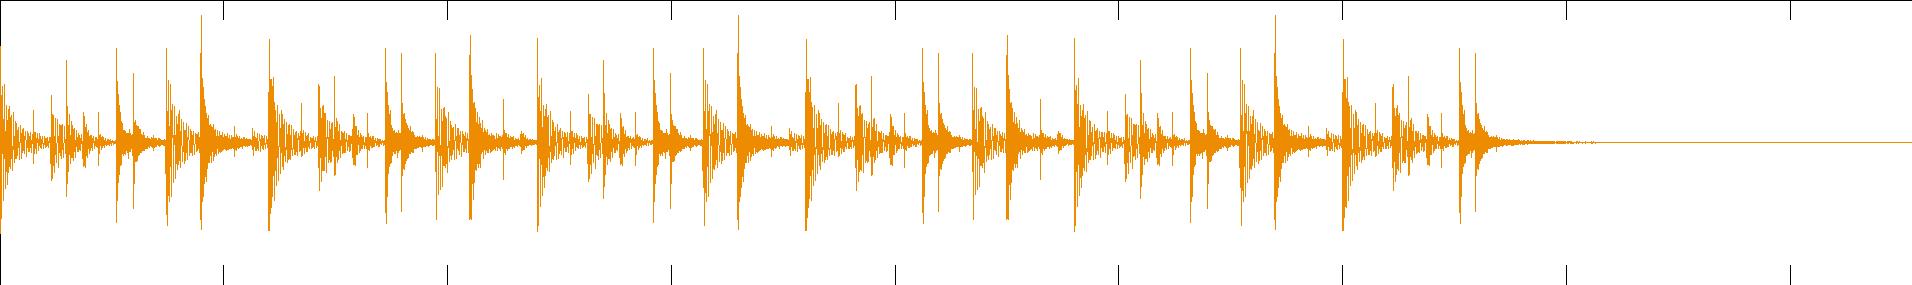 WaveDrum02_42_MIX